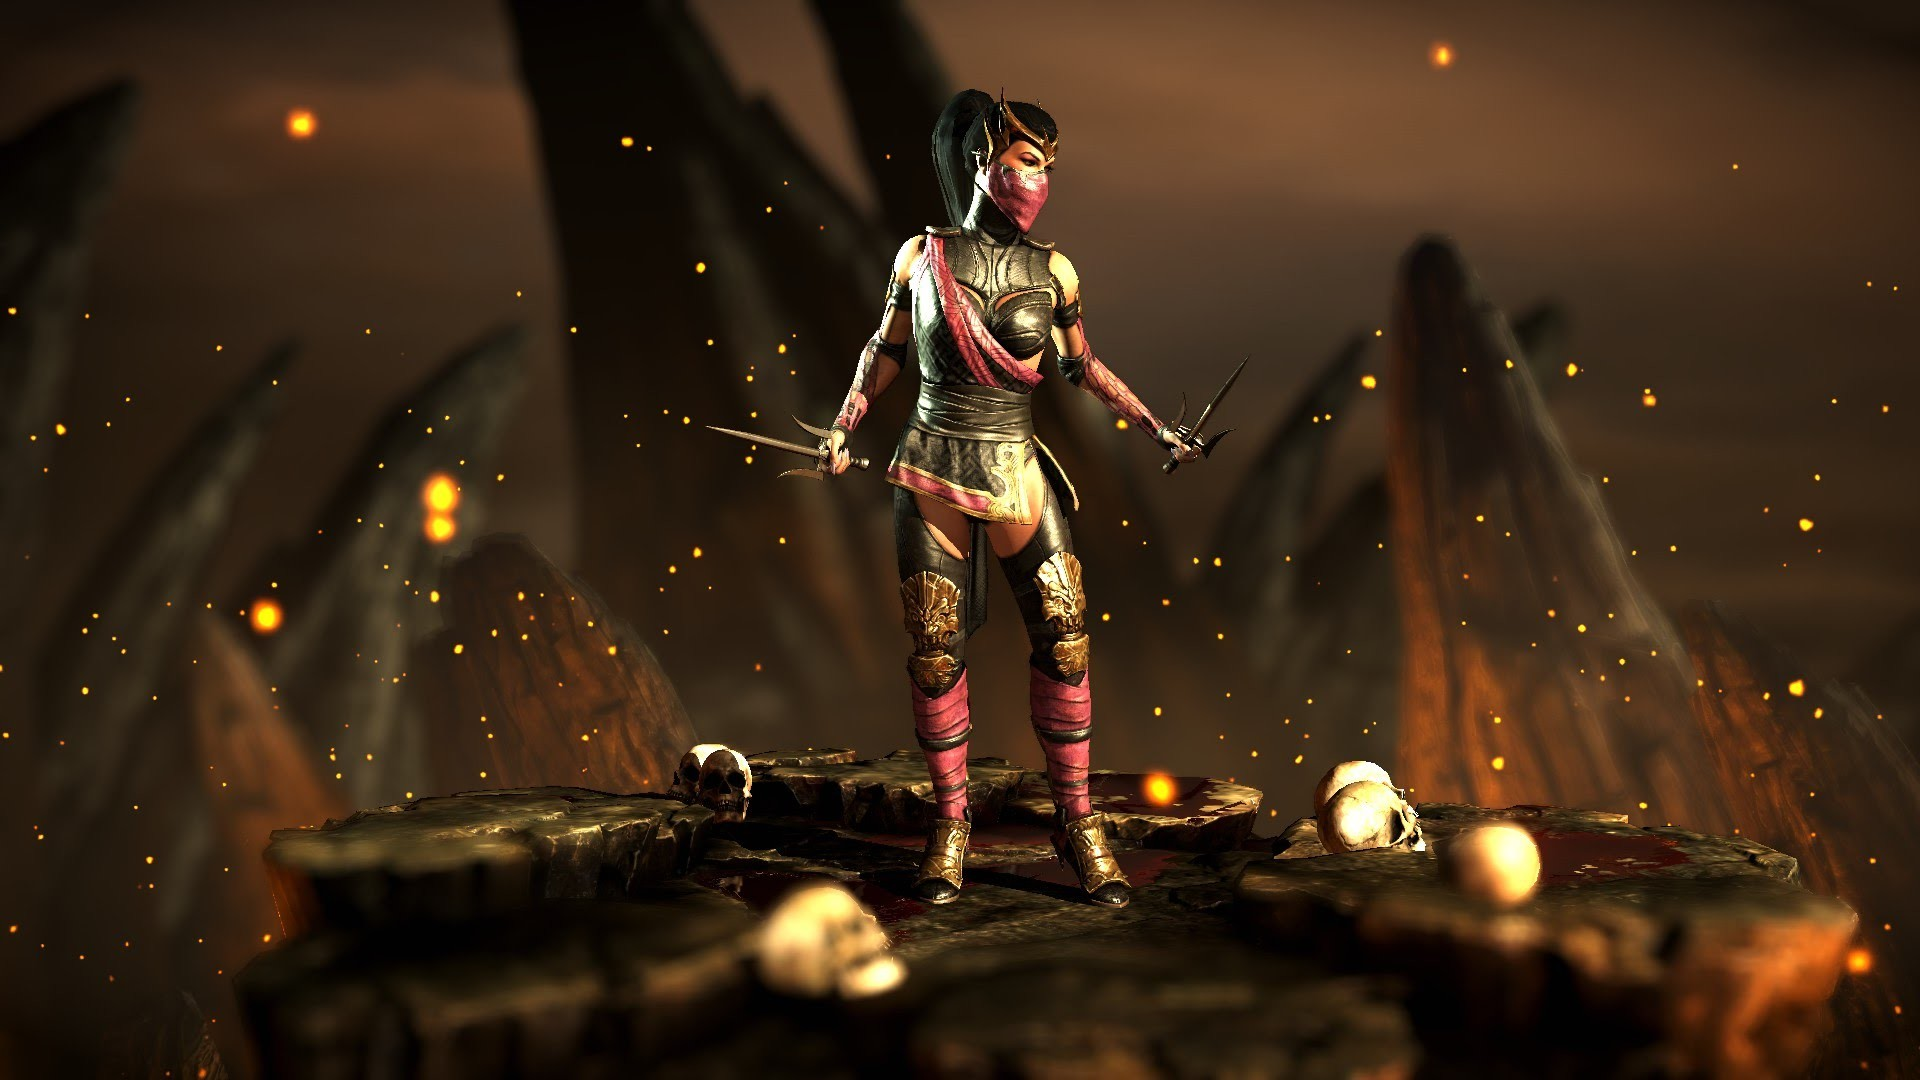 Mortal kombat kitana cosplay - 2 1